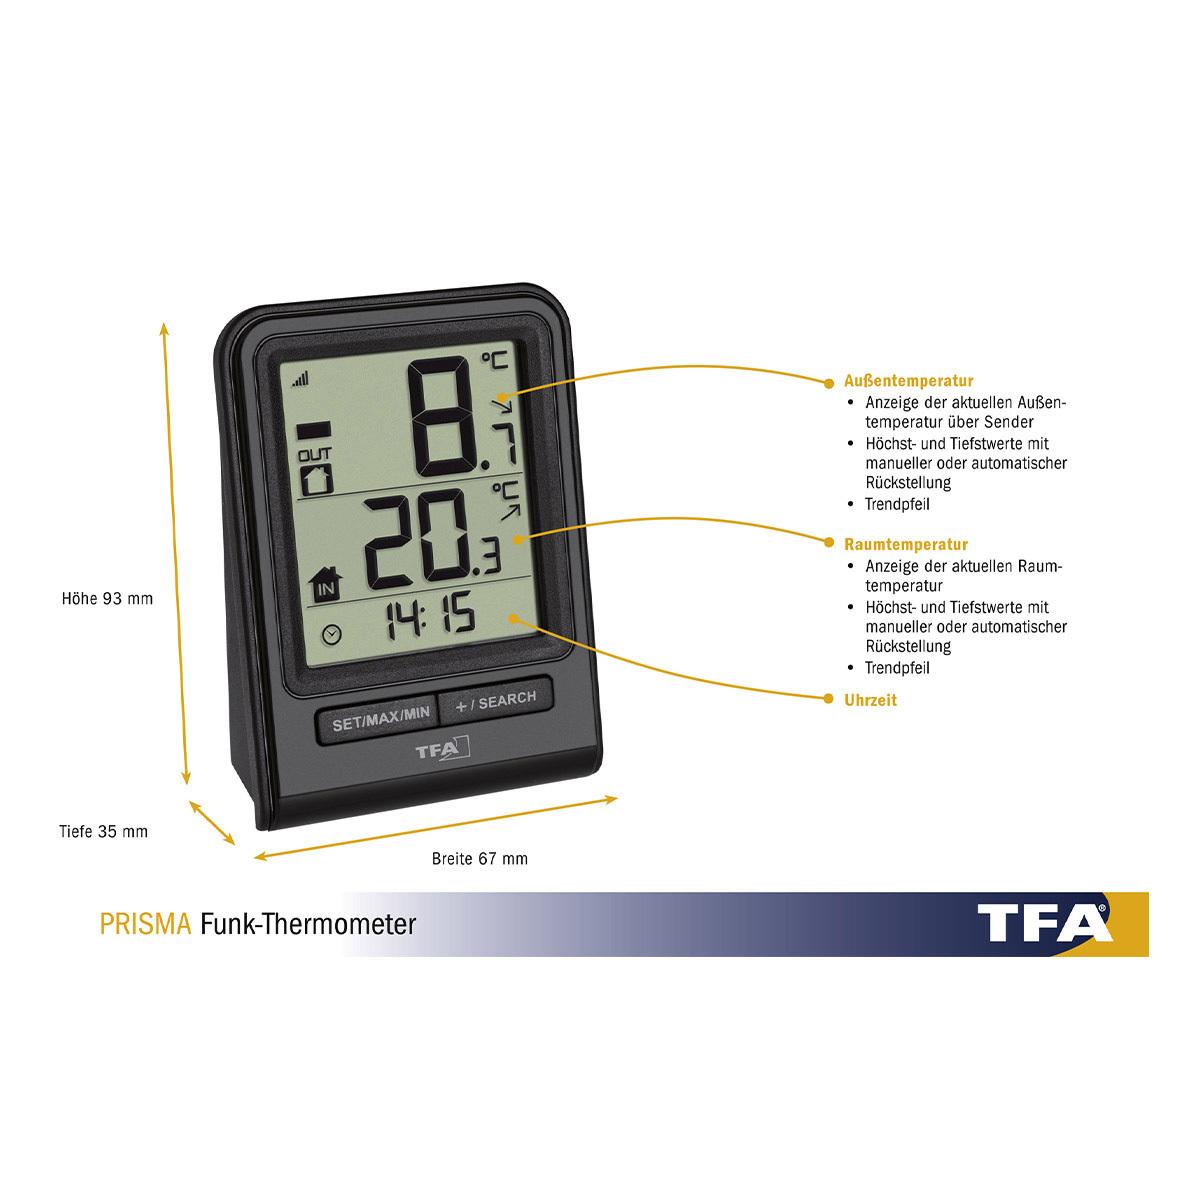 30-3063-01-funk-thermometer-prisma-abmessungen-1200x1200px.jpg